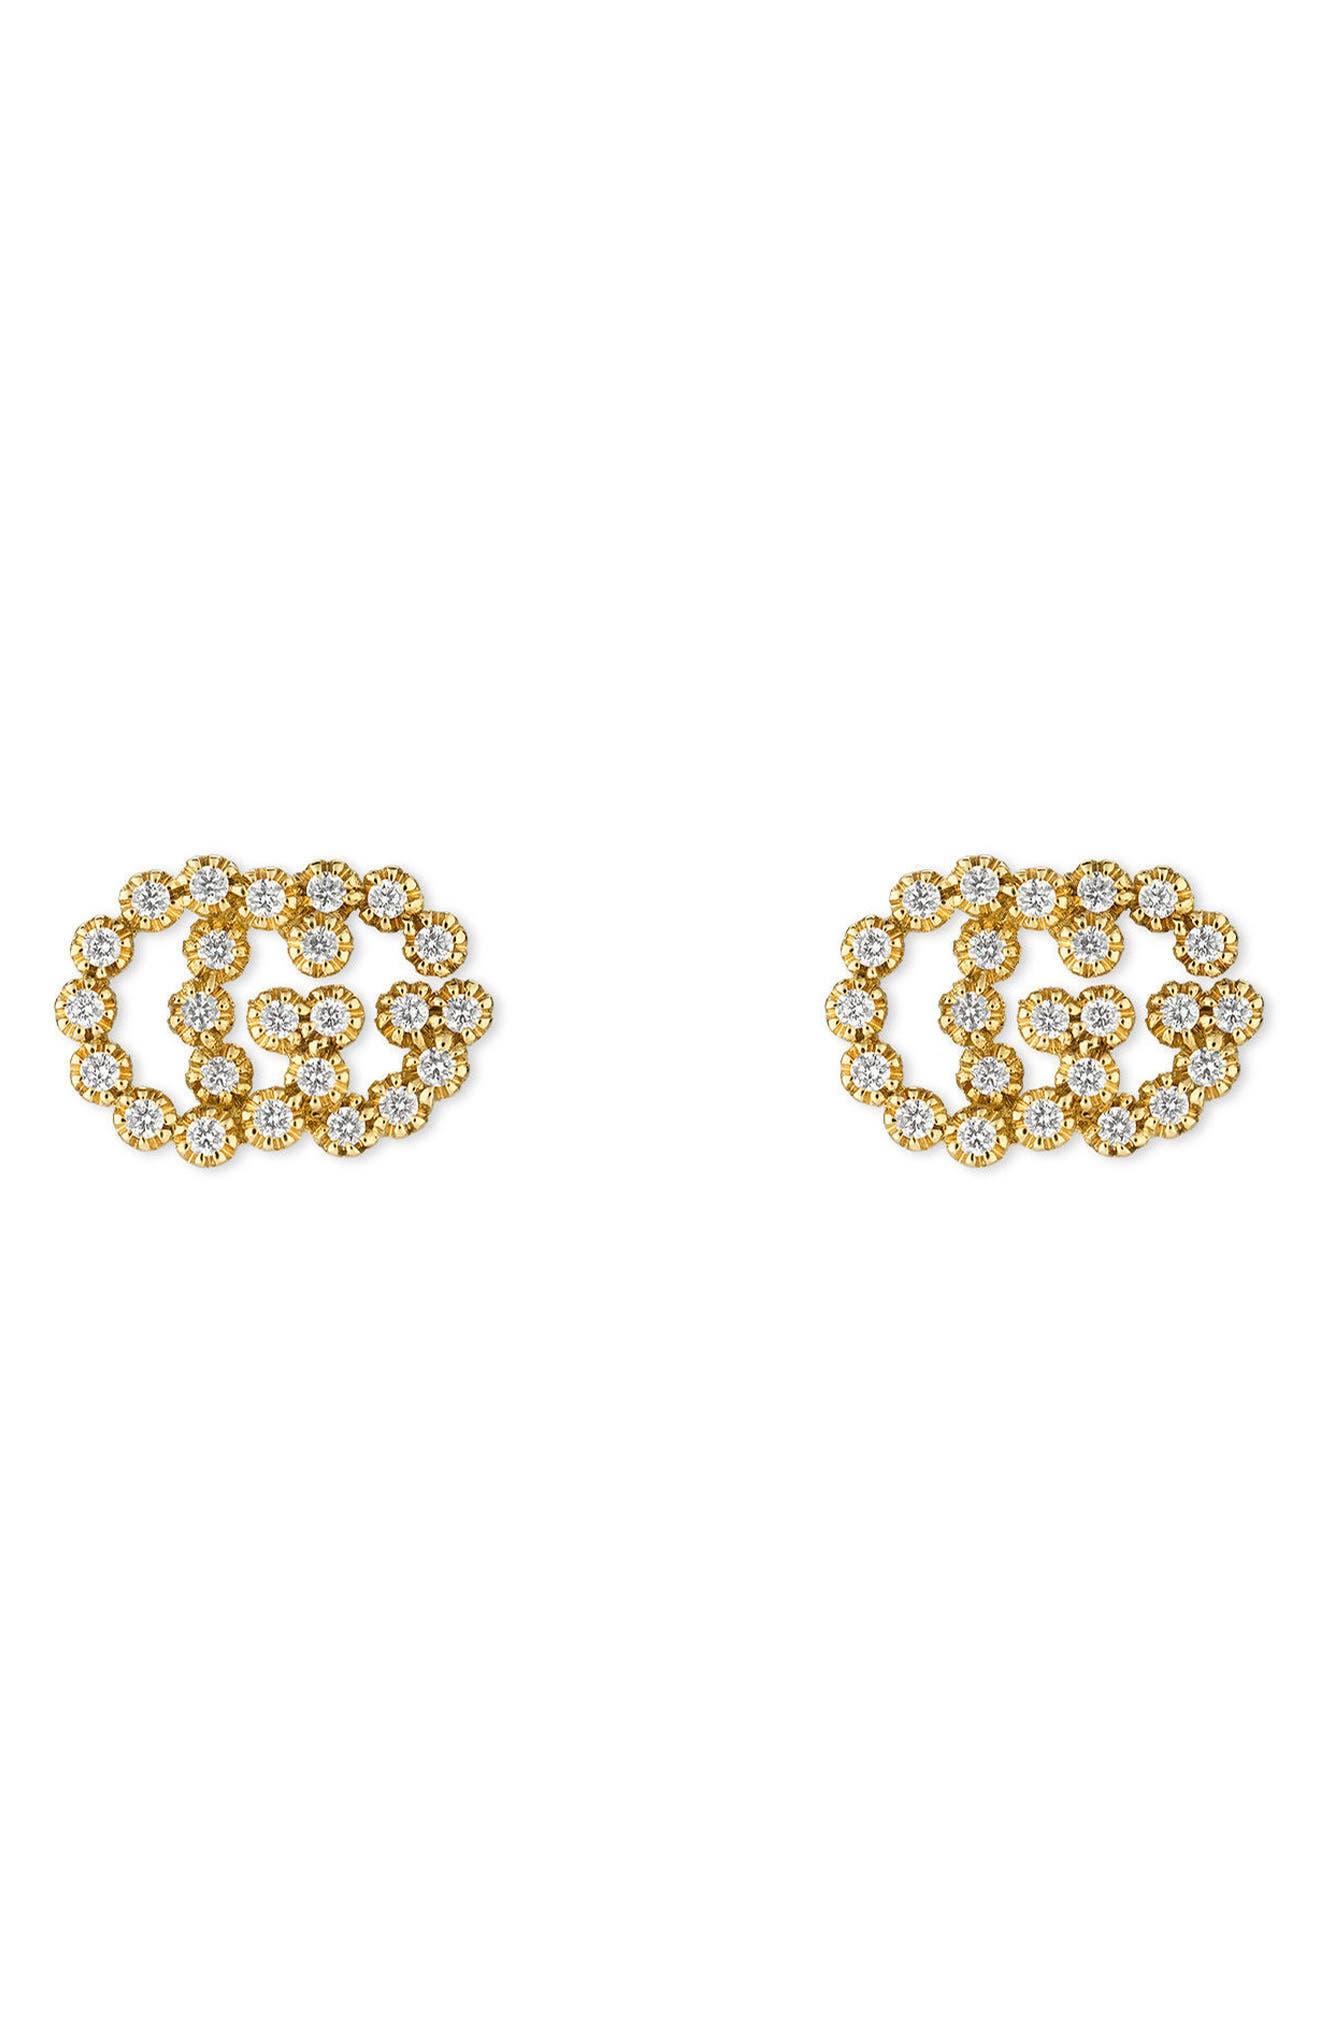 Main Image - Gucci Double-G Diamond Stud Earrings